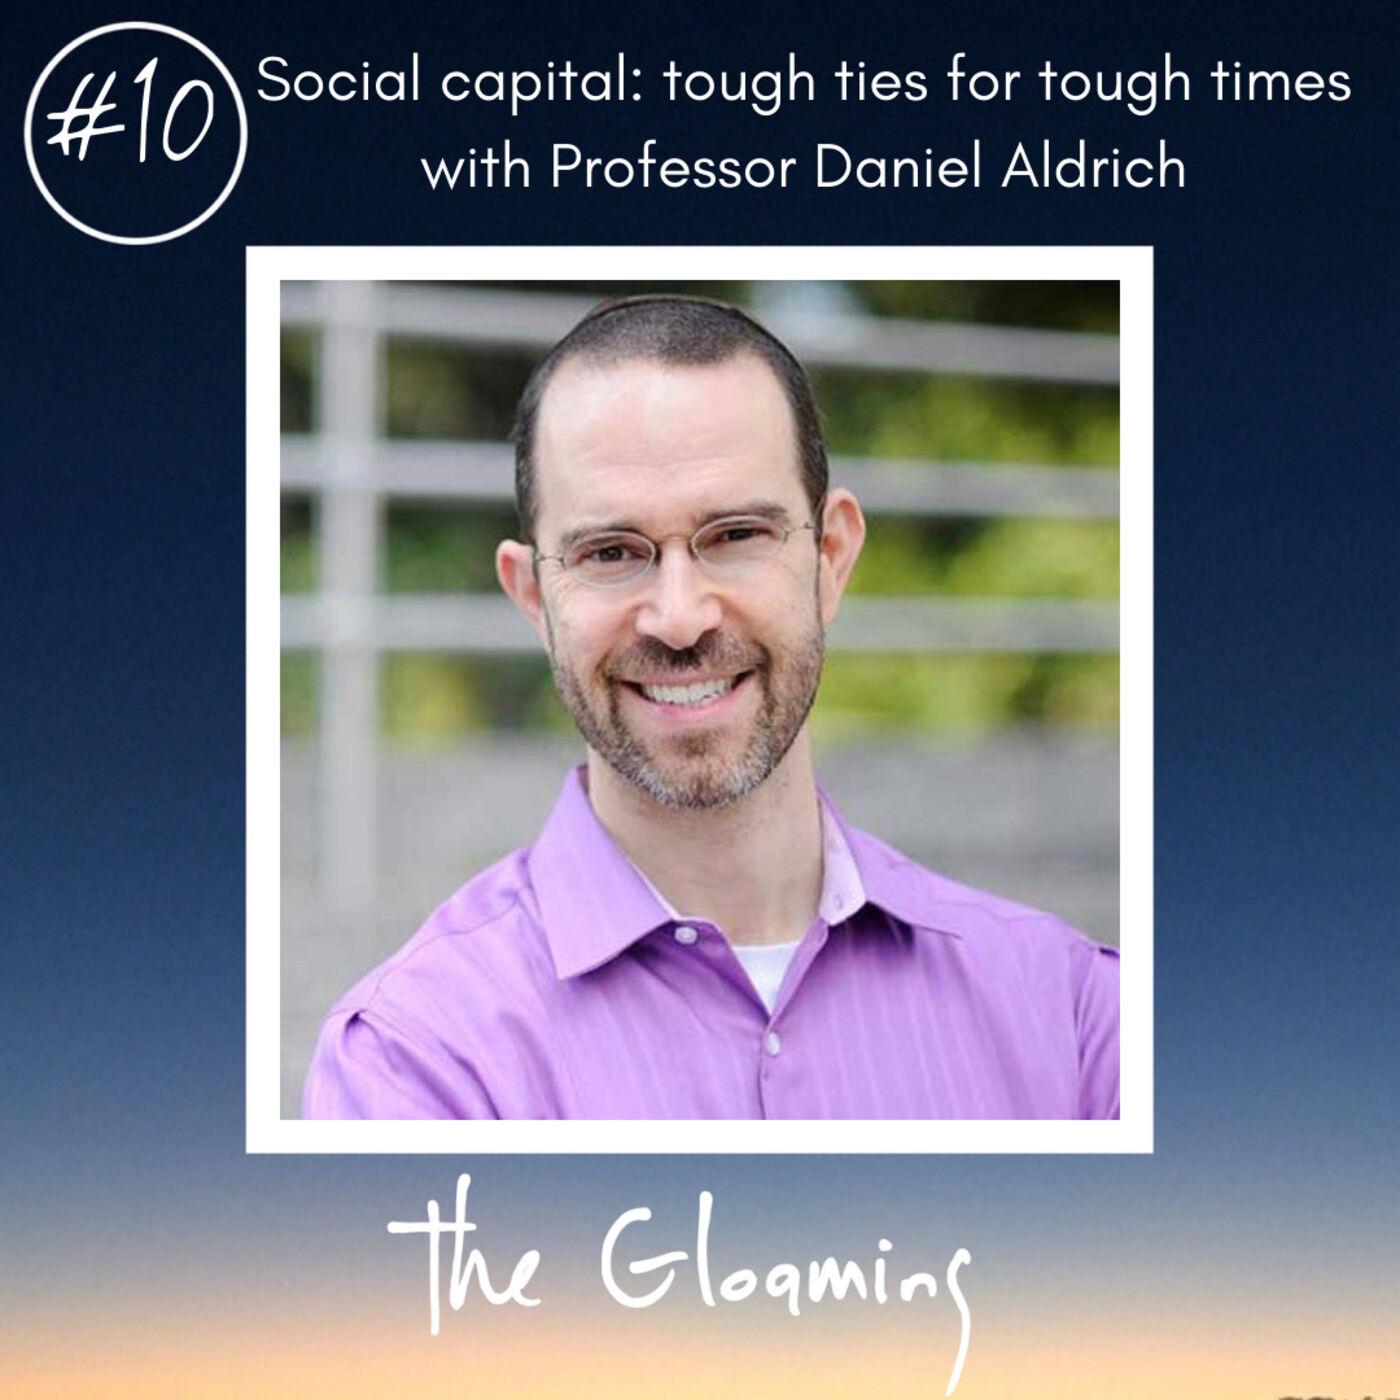 TG10: Social capital: tough ties for tough times (with Professor Daniel Aldrich)